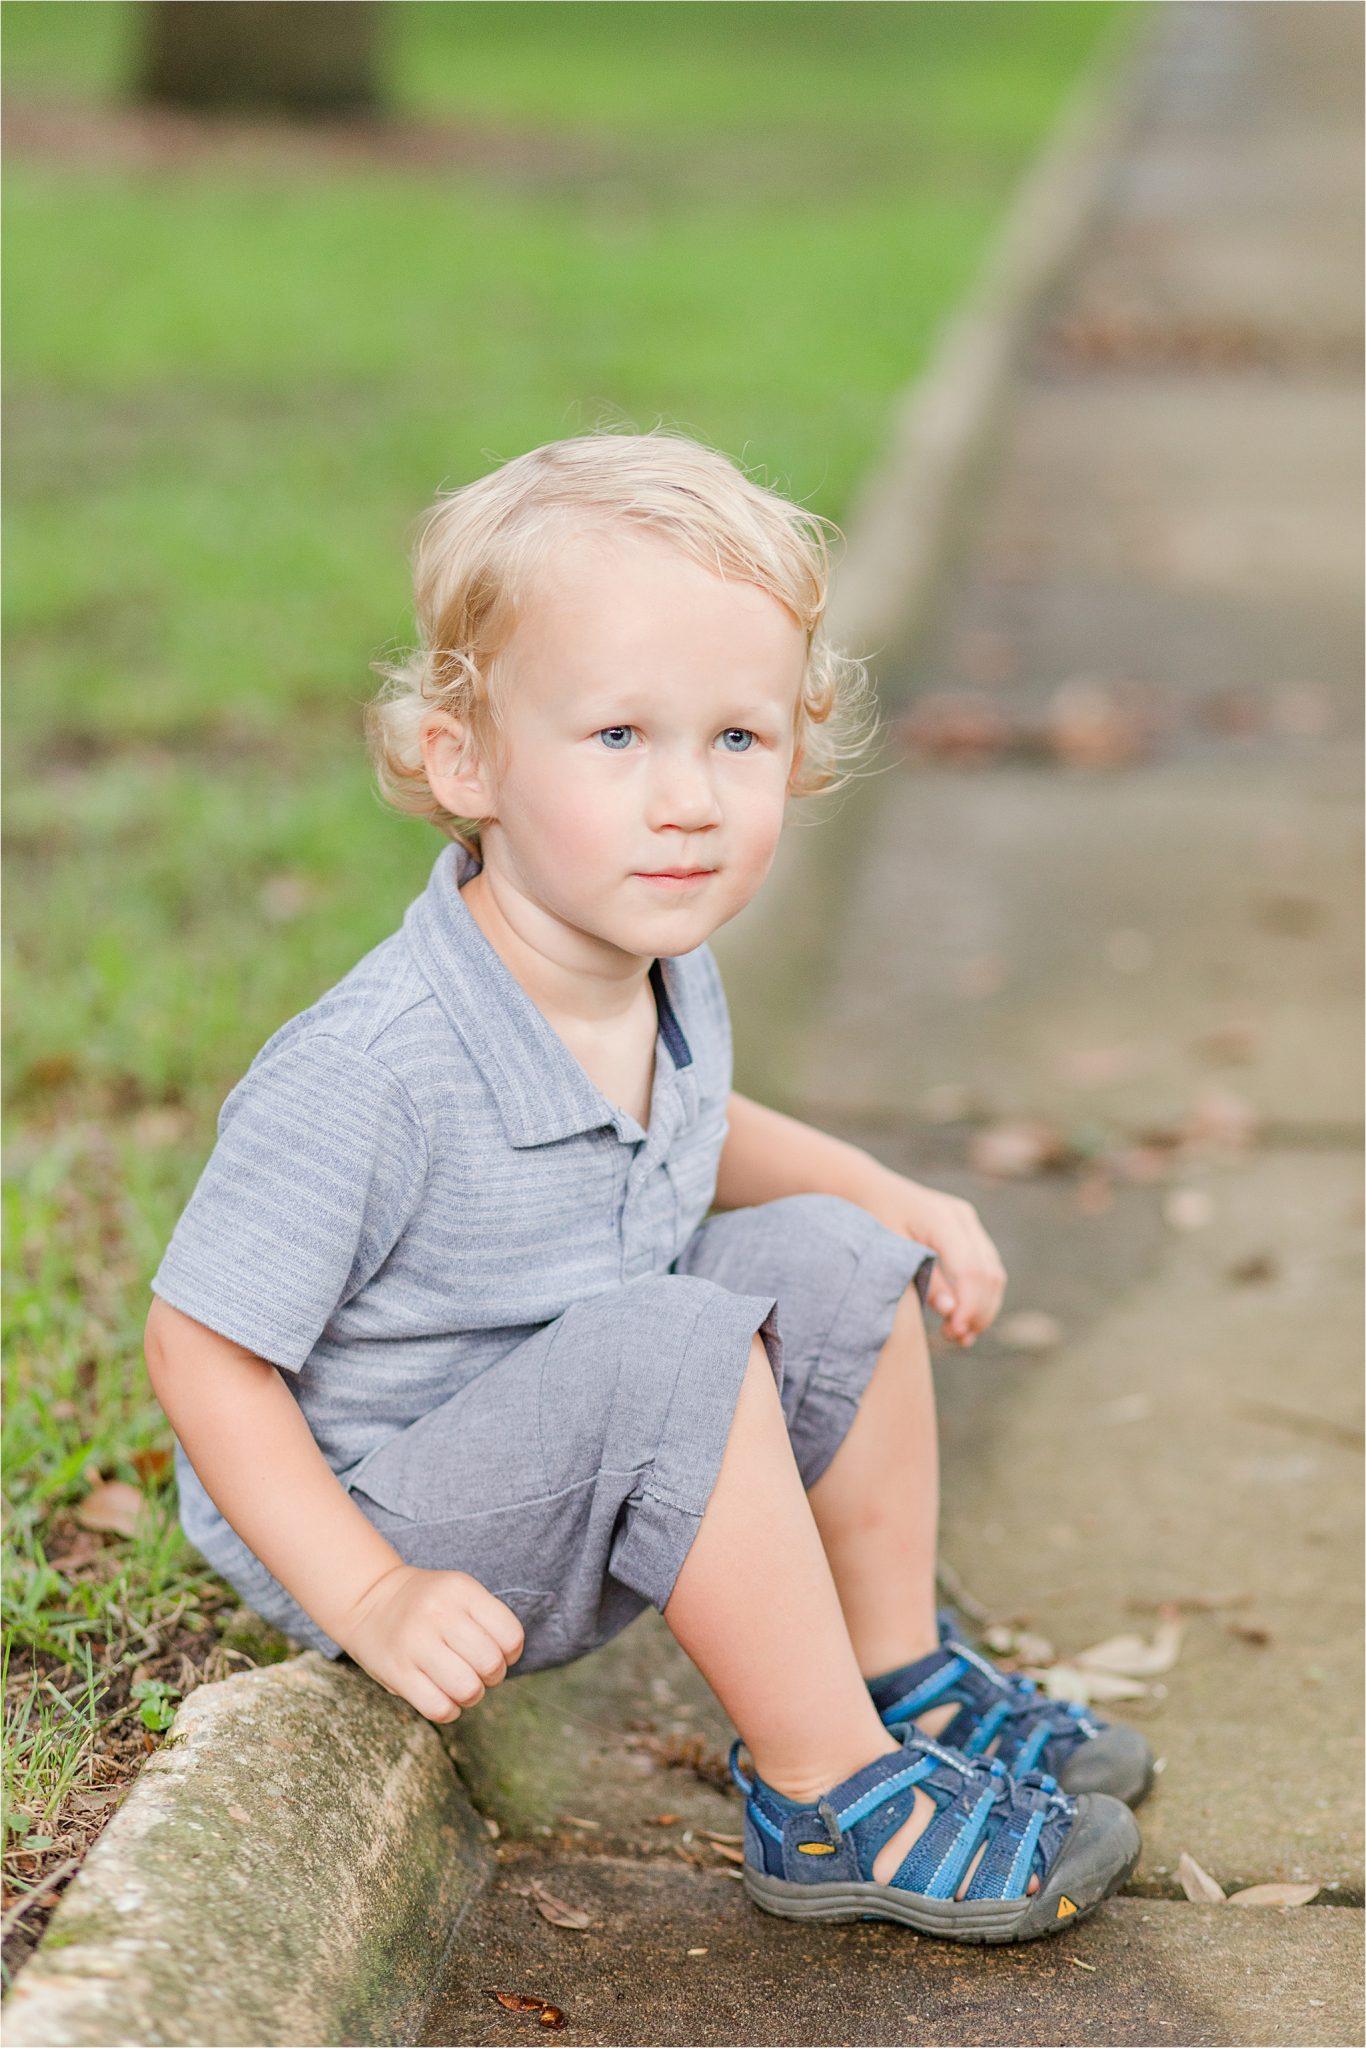 Toddler photography-Alabama photographer-pics of kids-child portraits-family photos